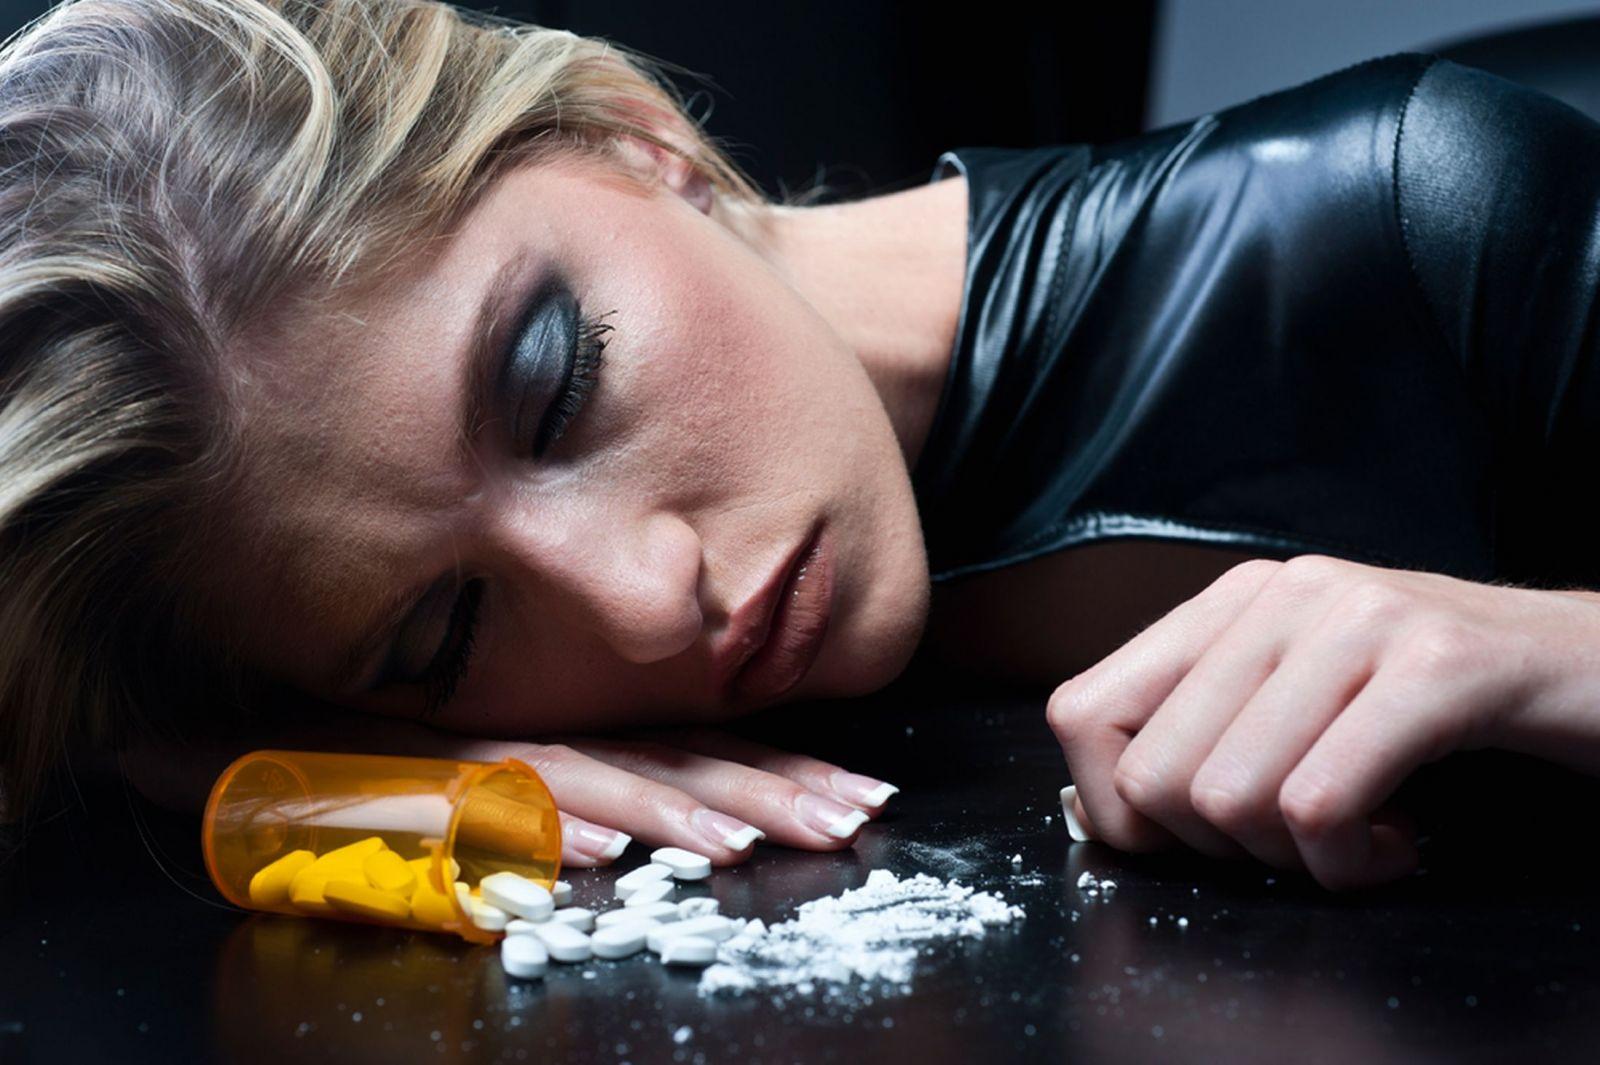 ¿Es éticamente correcto consumir drogas?